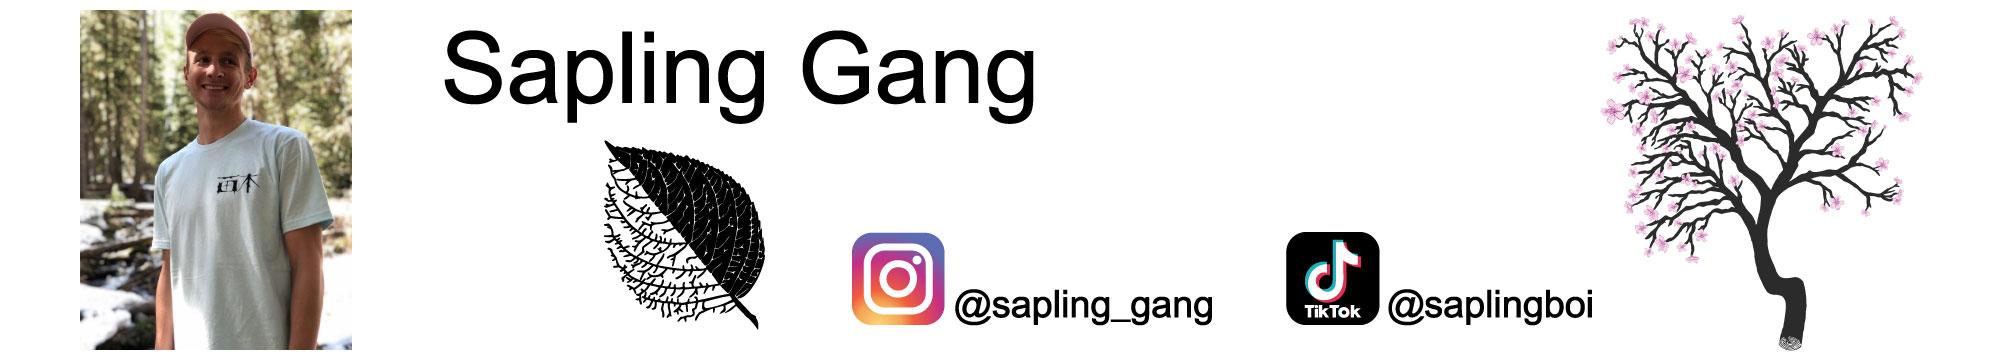 Sapling Gang